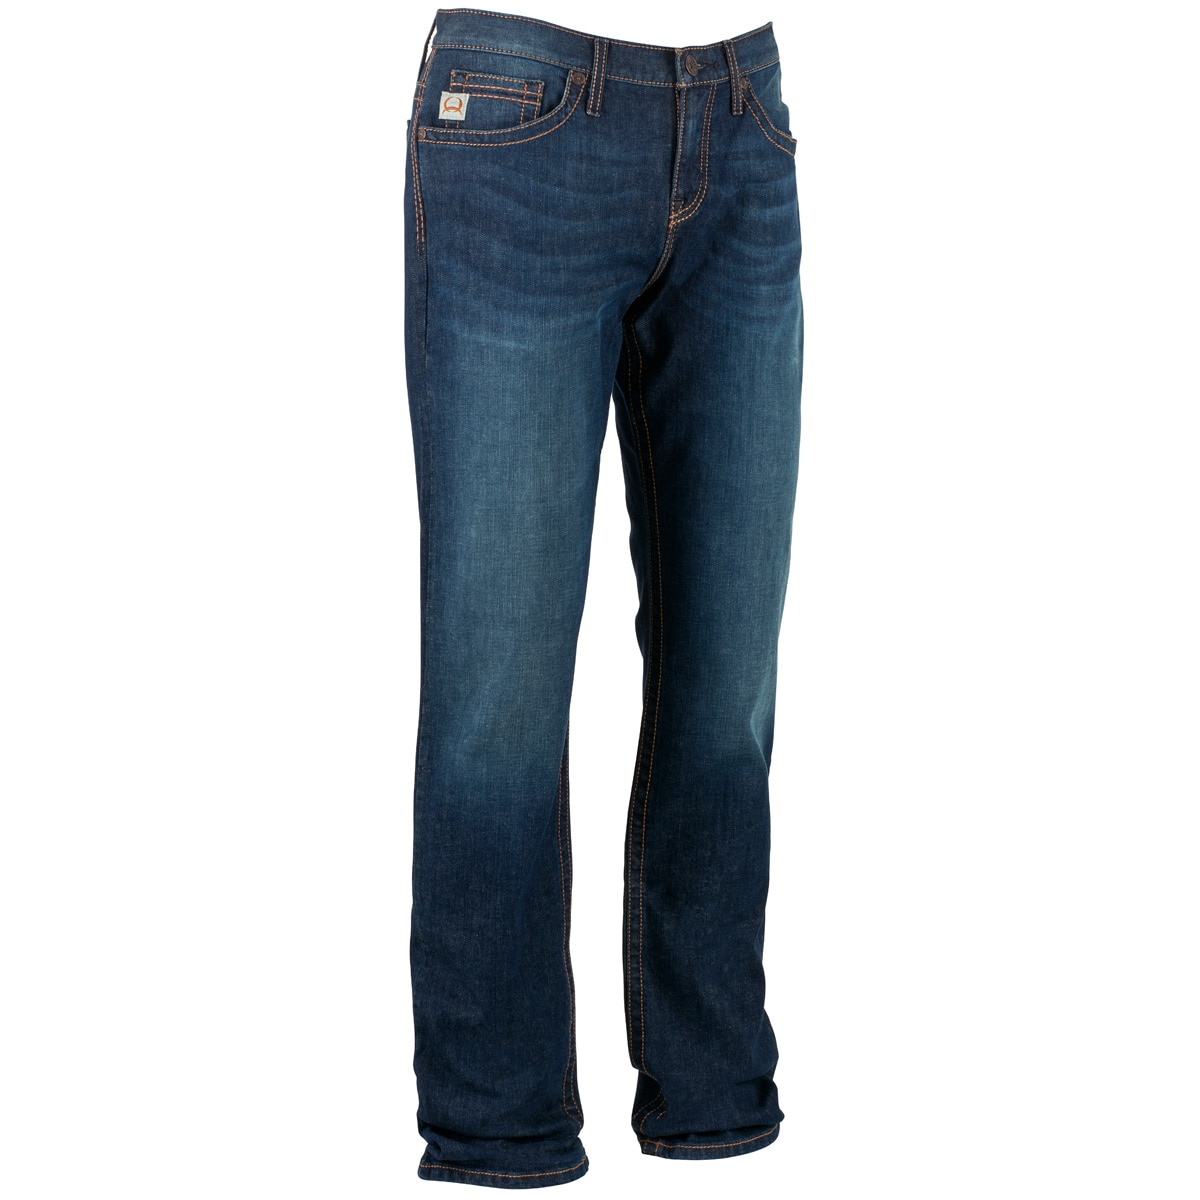 082a4ac1faf Cinch Men's Ian Jeans With 360 Flex Denim - Mid Rise Slim Bootcut. Cinch |  Item #27670. write a review